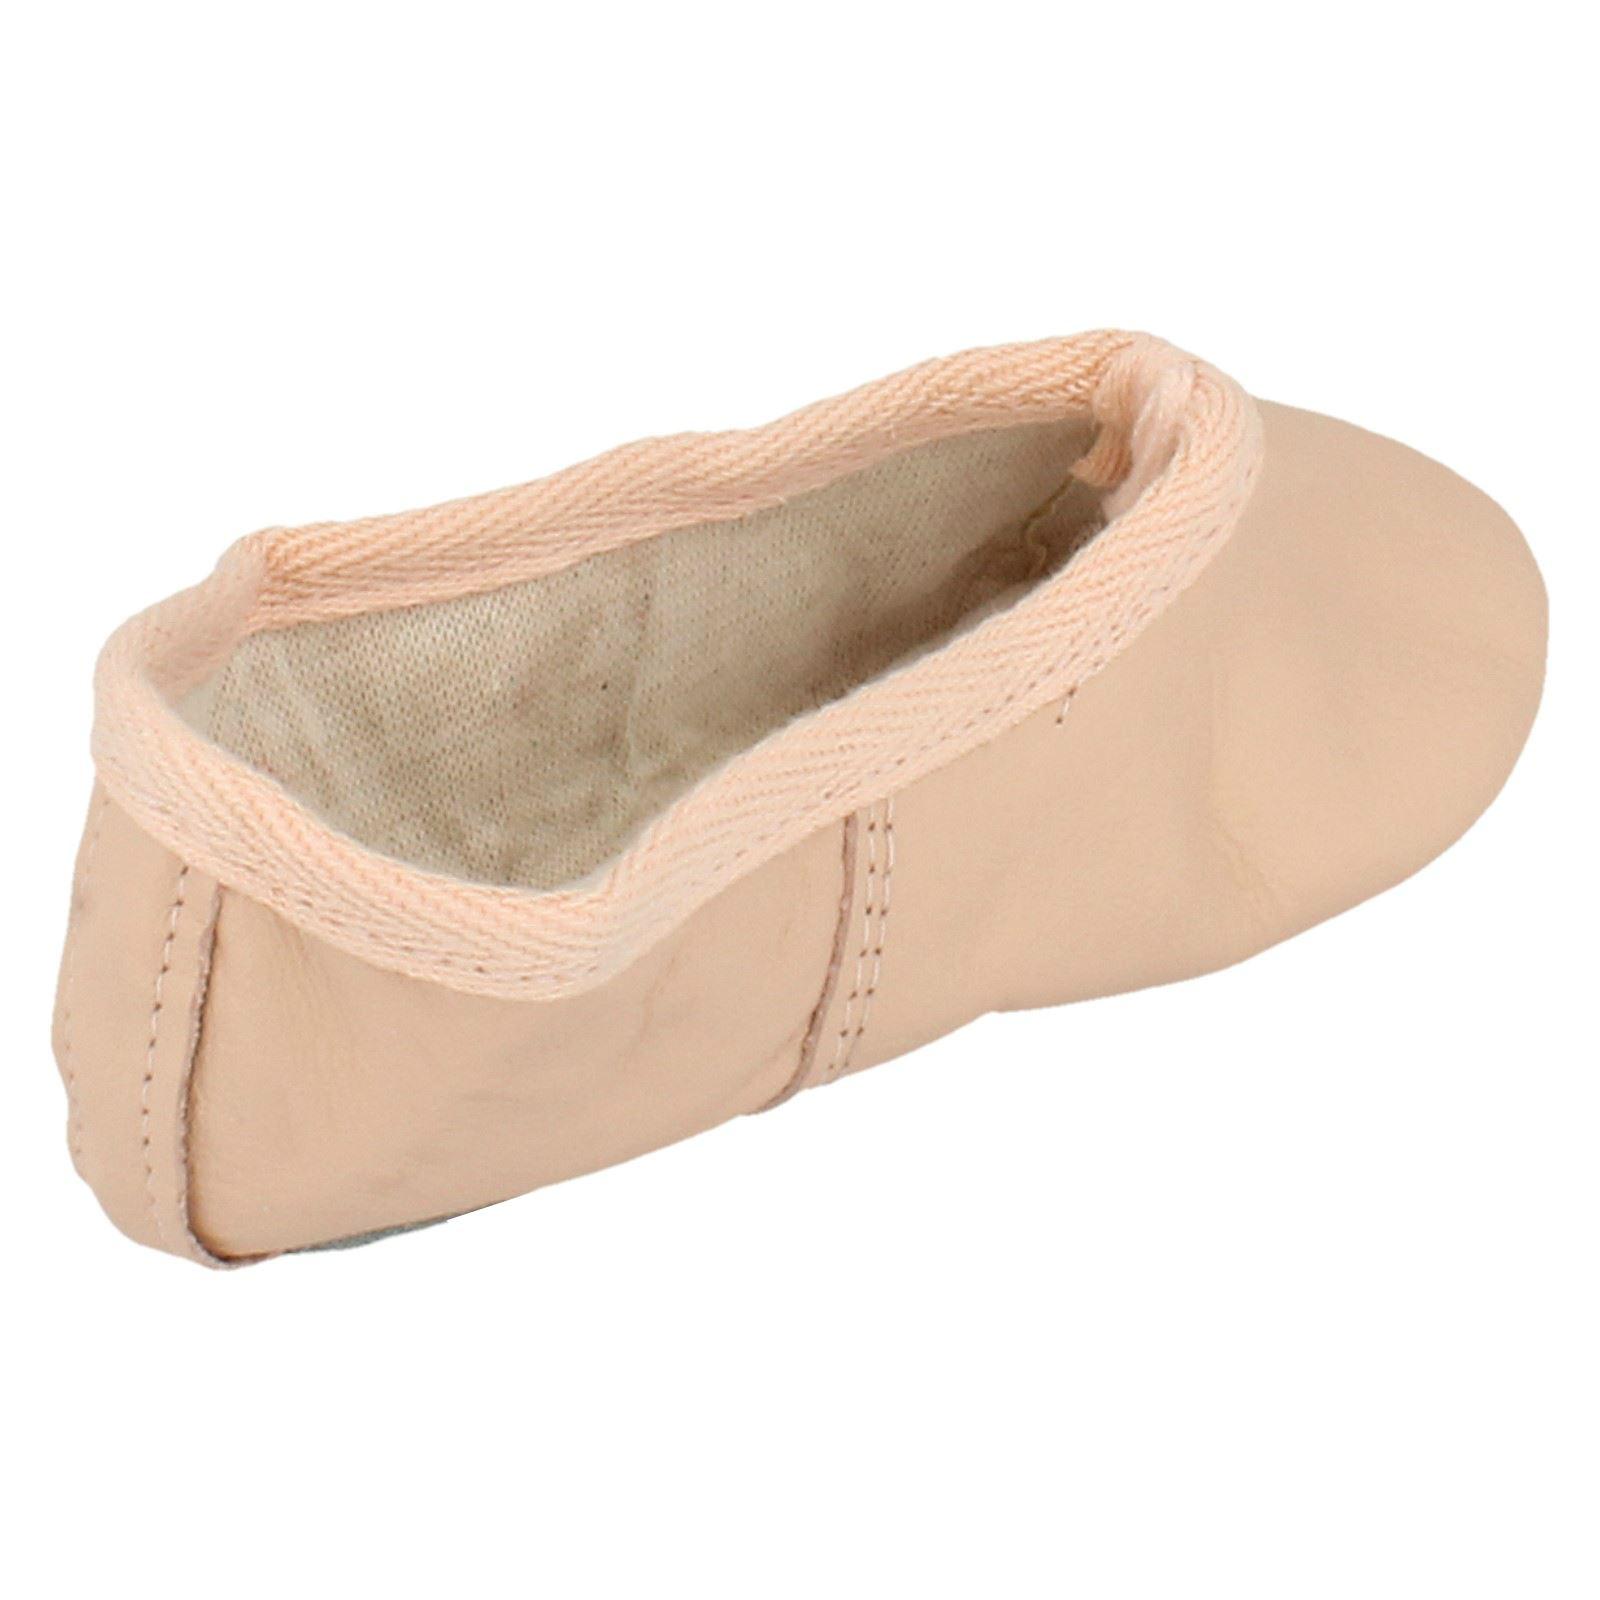 Childrens Gandolfi Con Cordones Zapatos De Ballet Danza Zapatos De Ballet-D